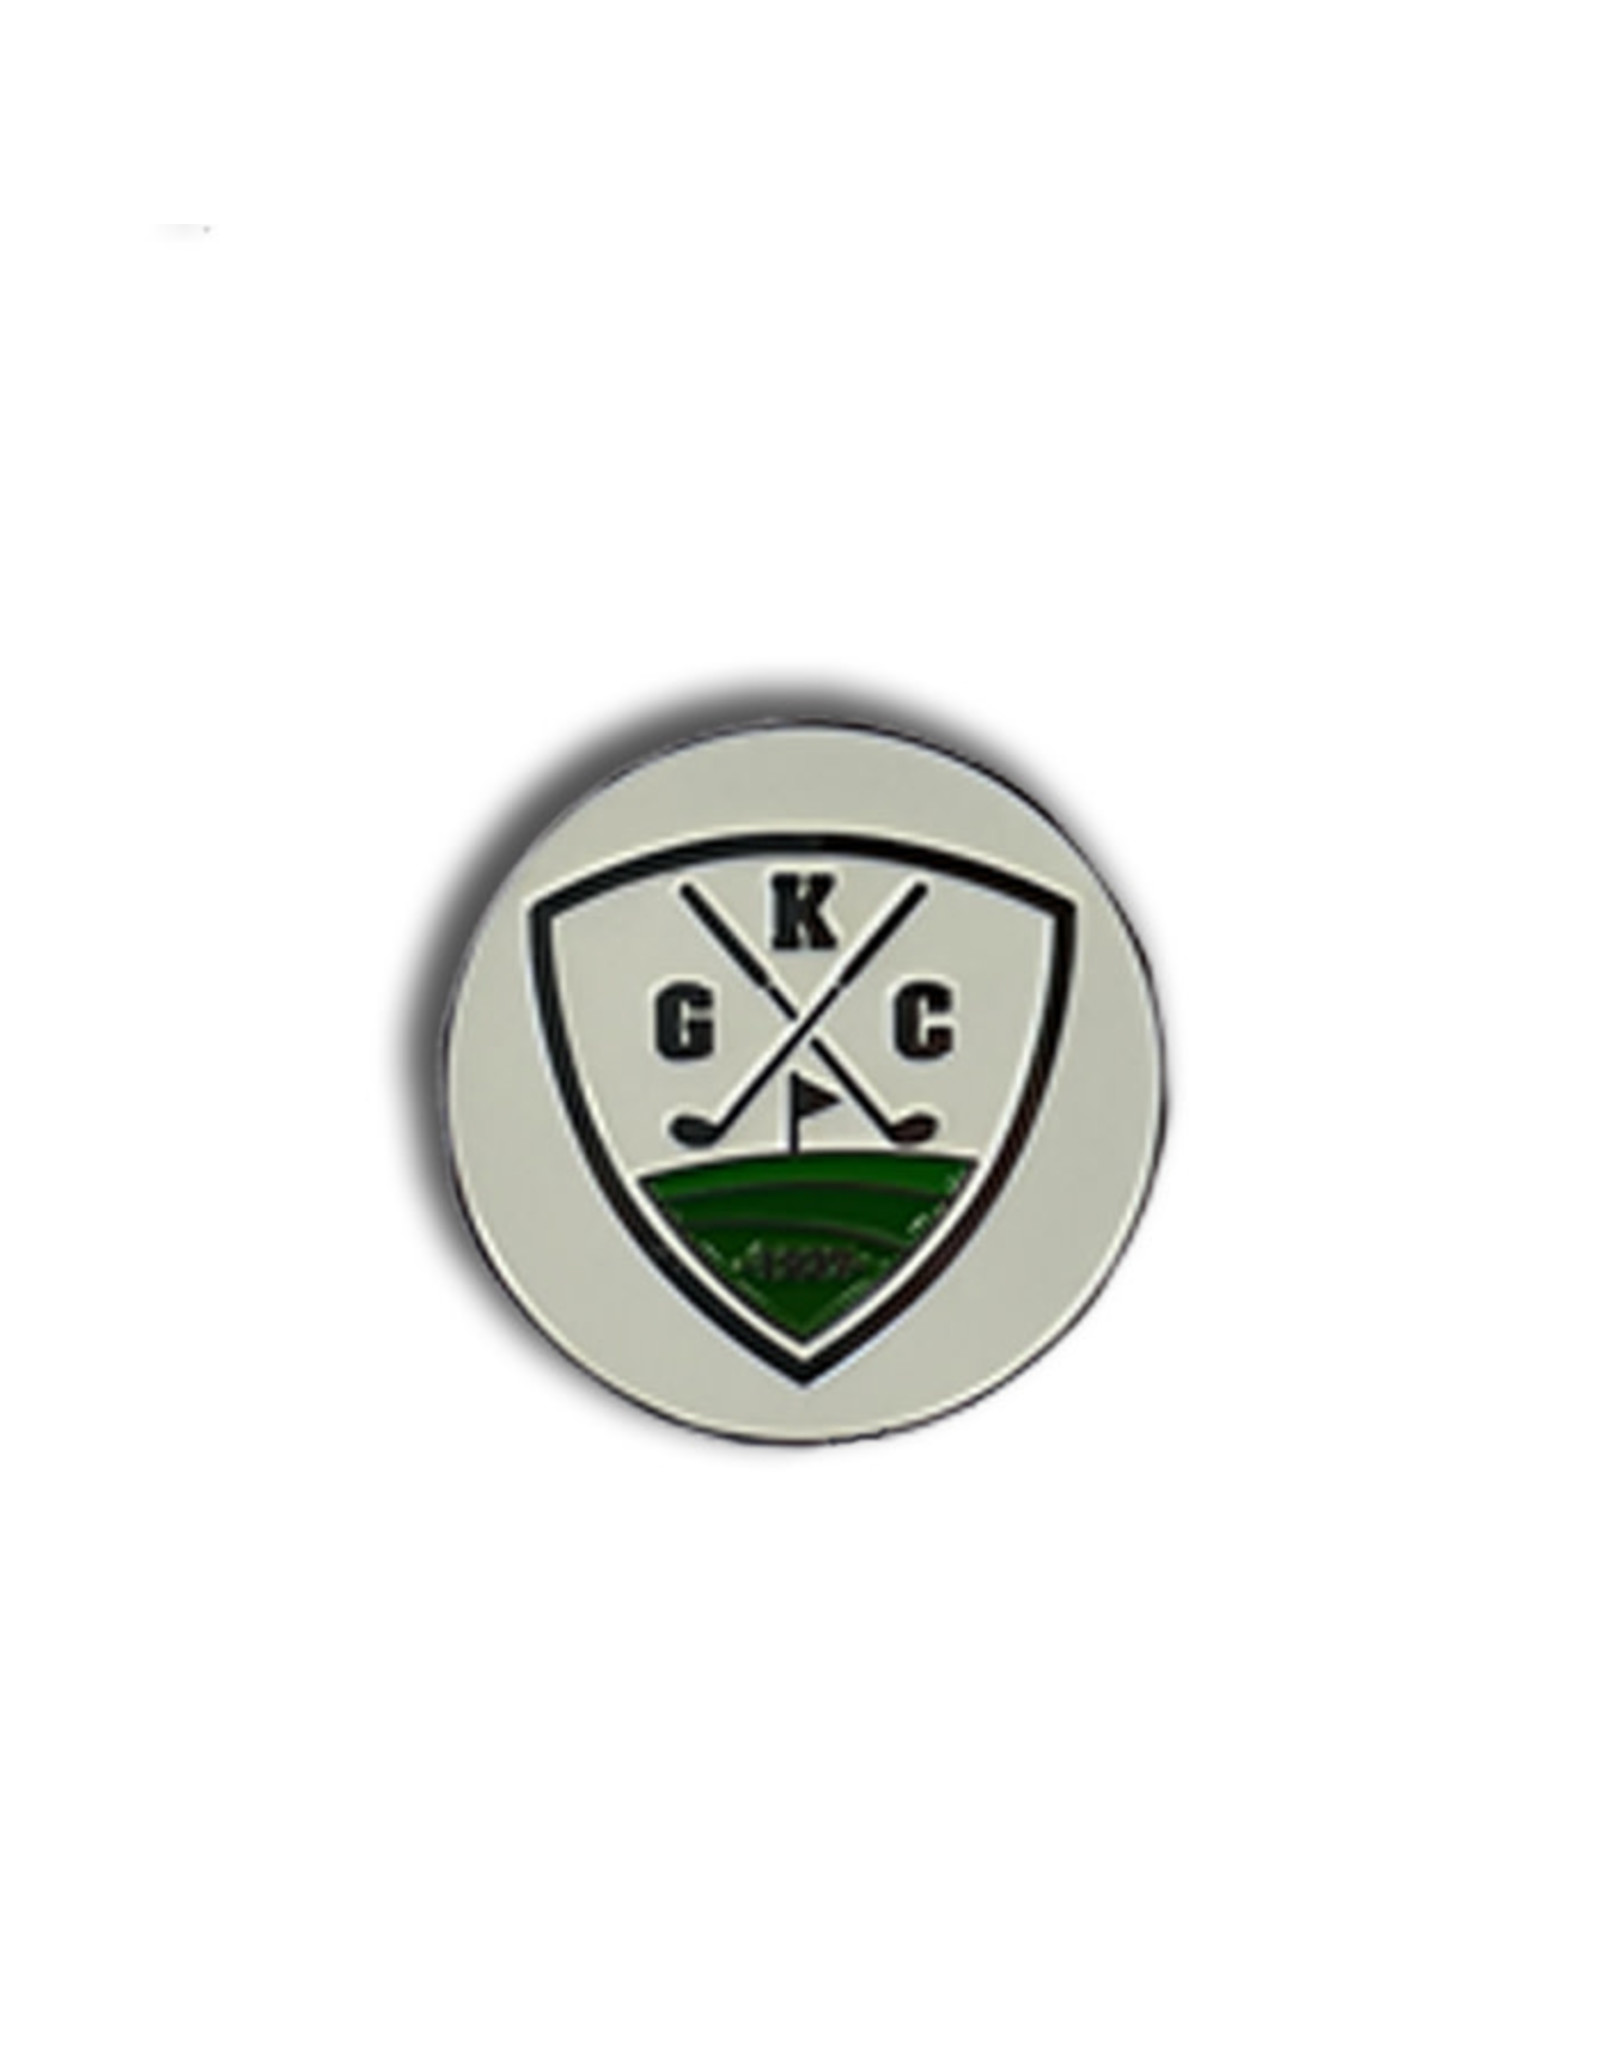 KGC Poker Chip Ball Markers